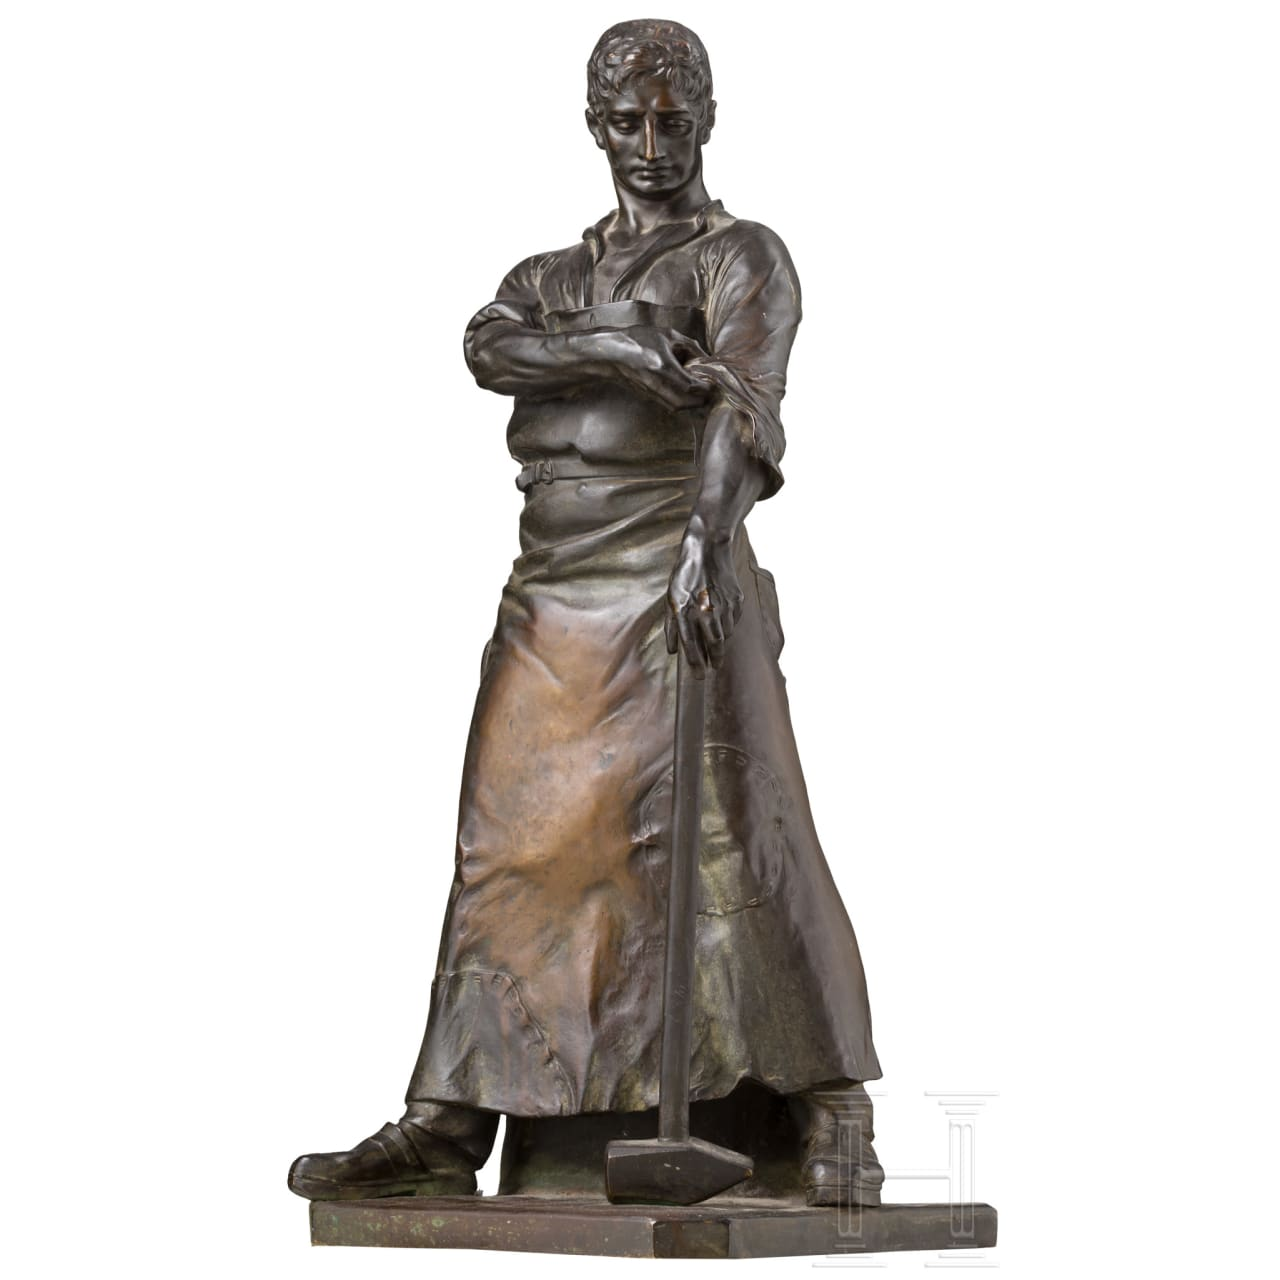 Large bronze figure of a blacksmith, c. 1910